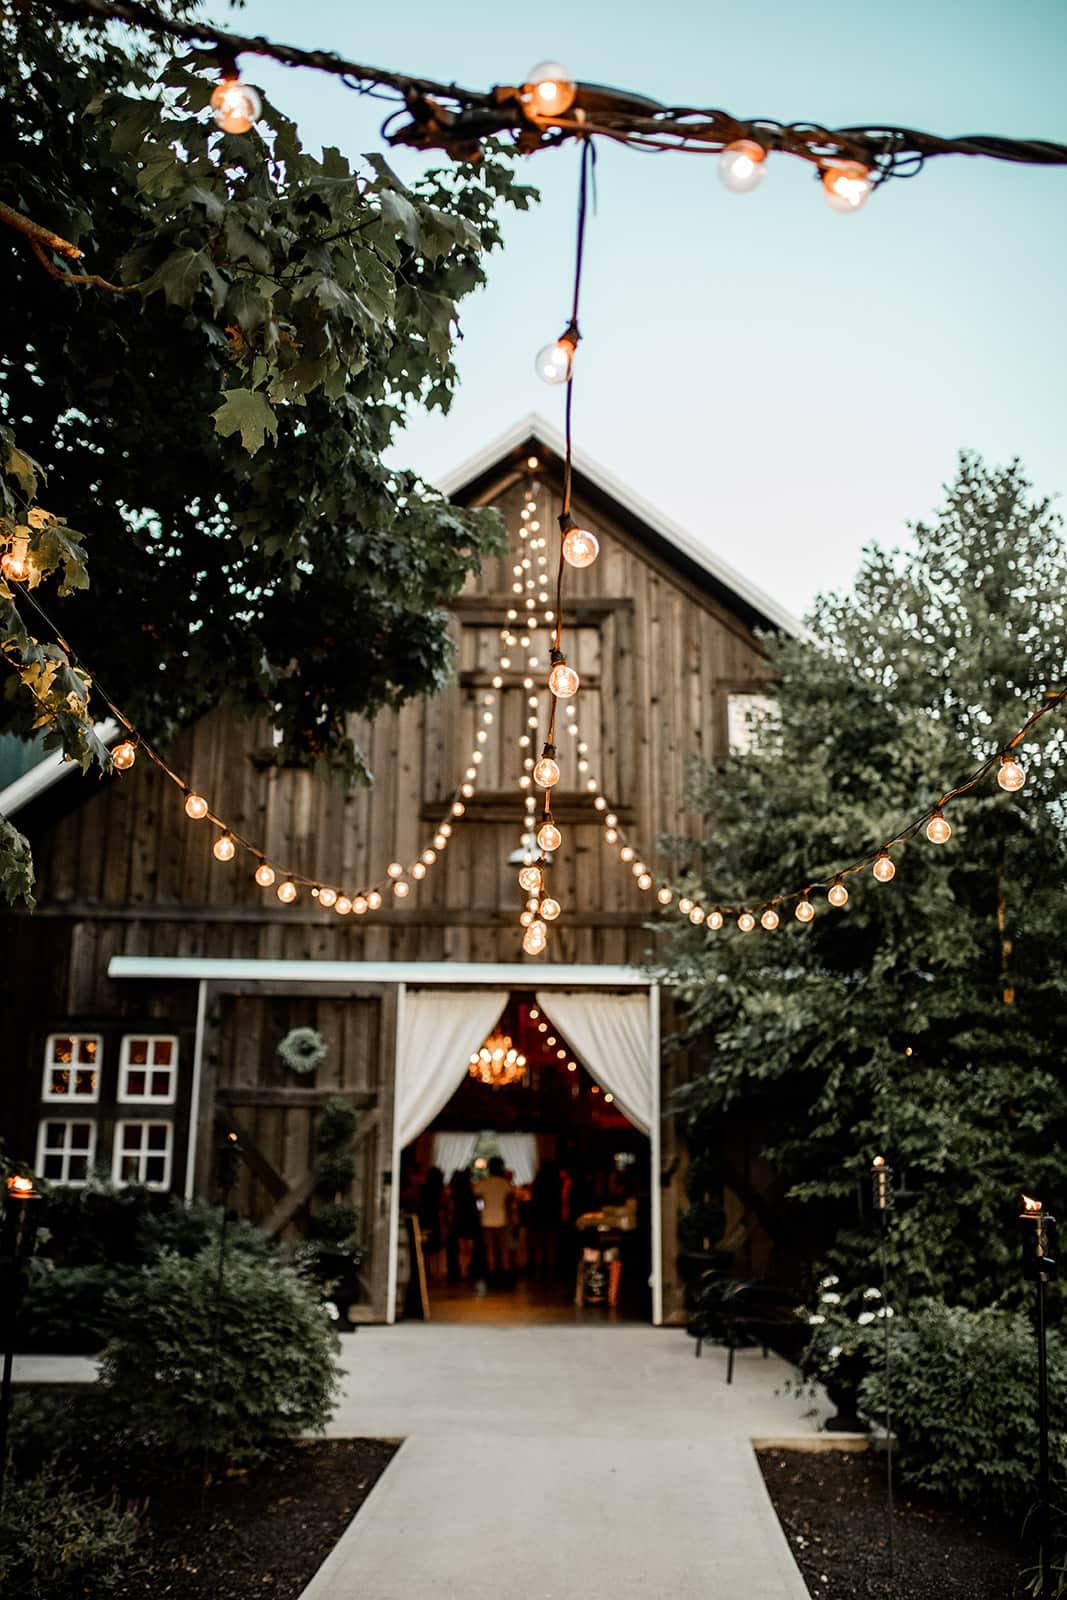 Decorated barn